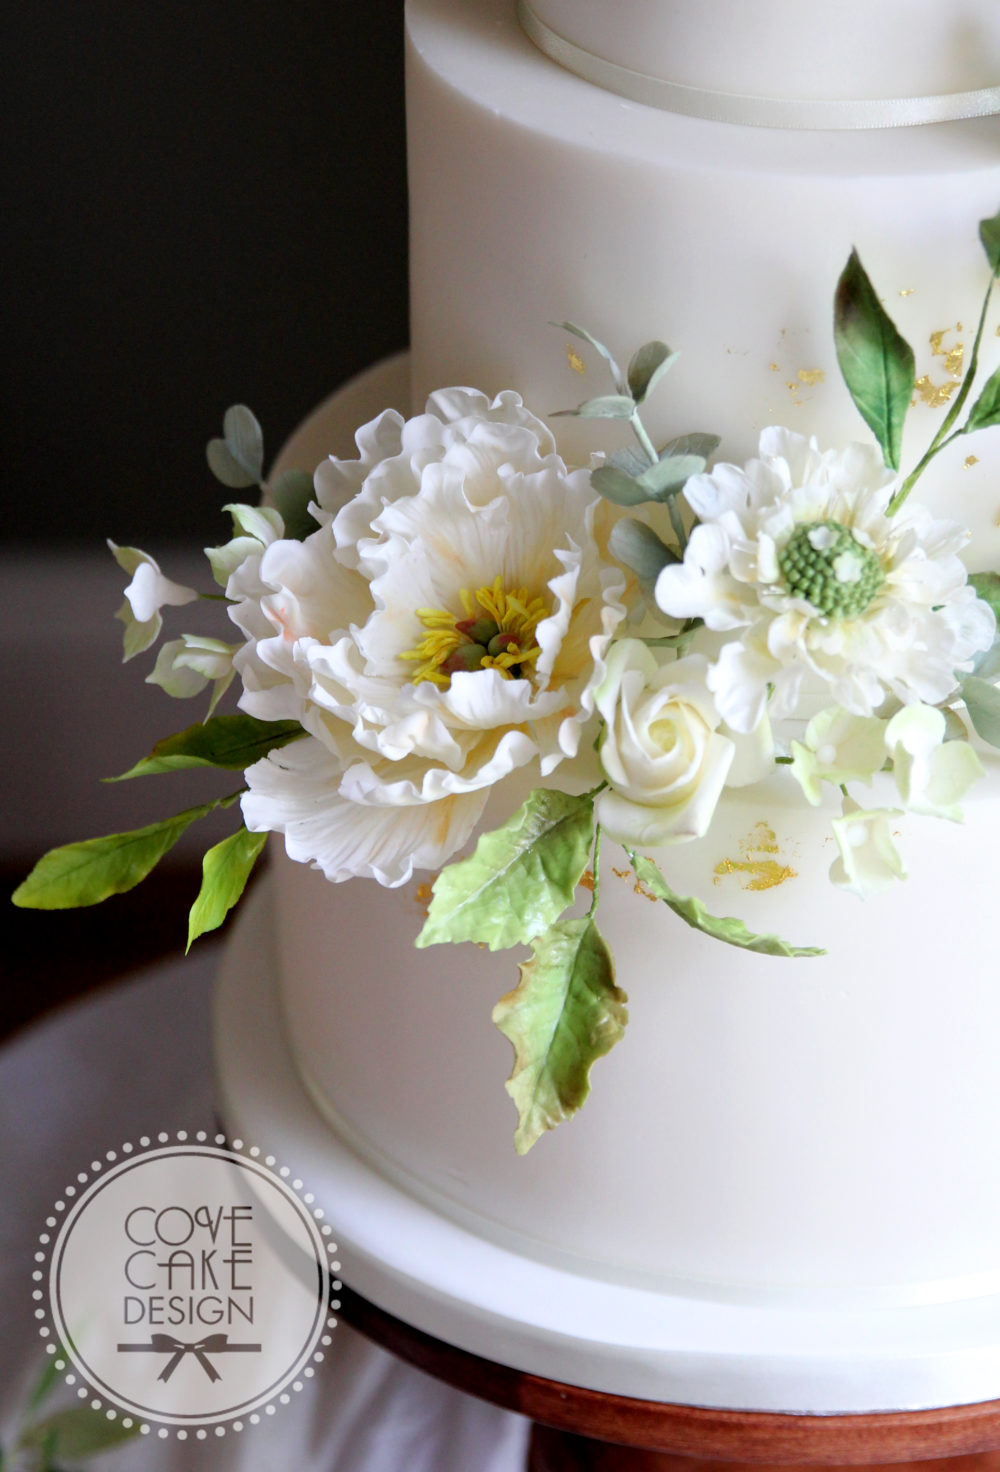 Summer White Wedding Cake Cove Cake Design